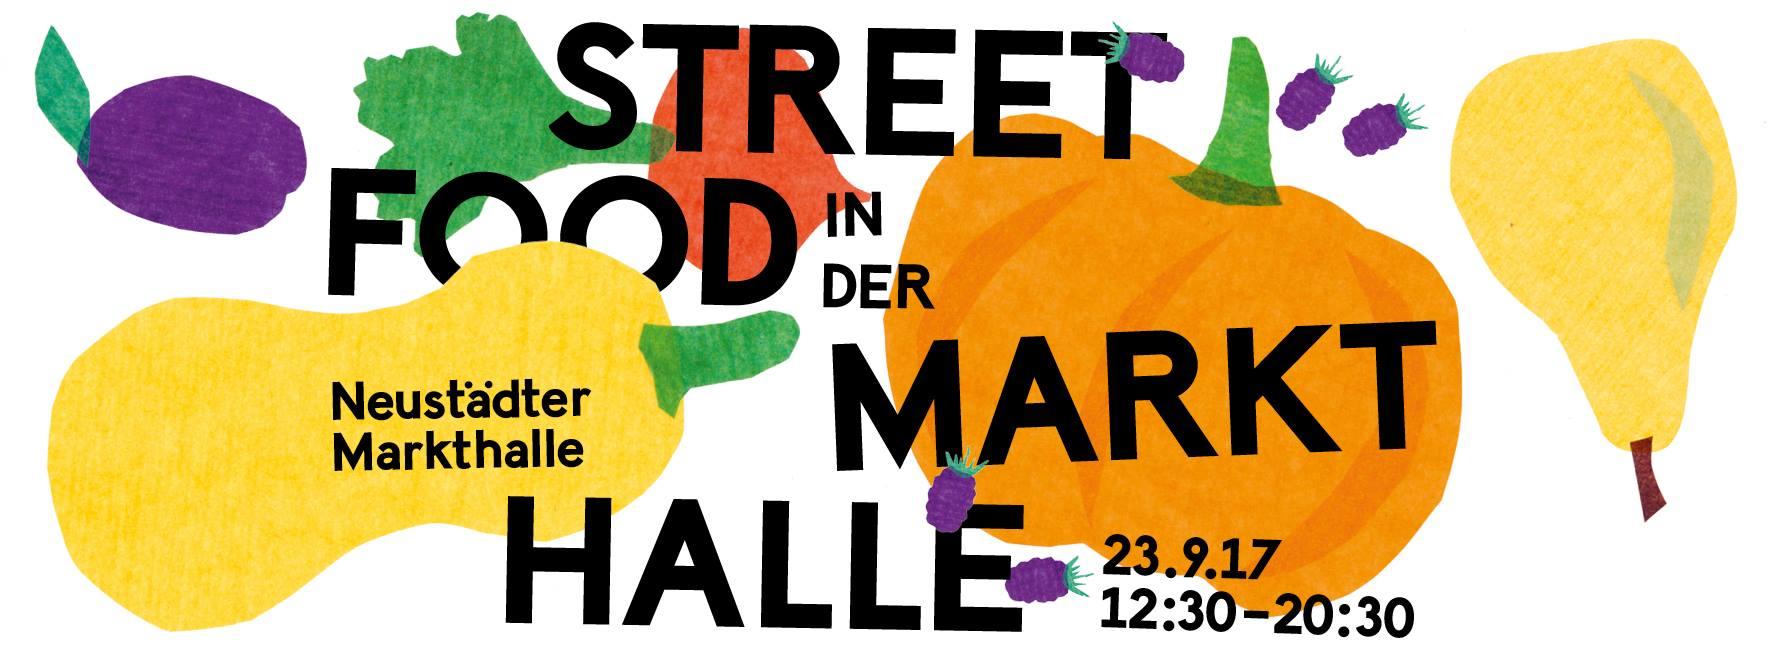 Plakat Herbst-Streetfoodmarkt.